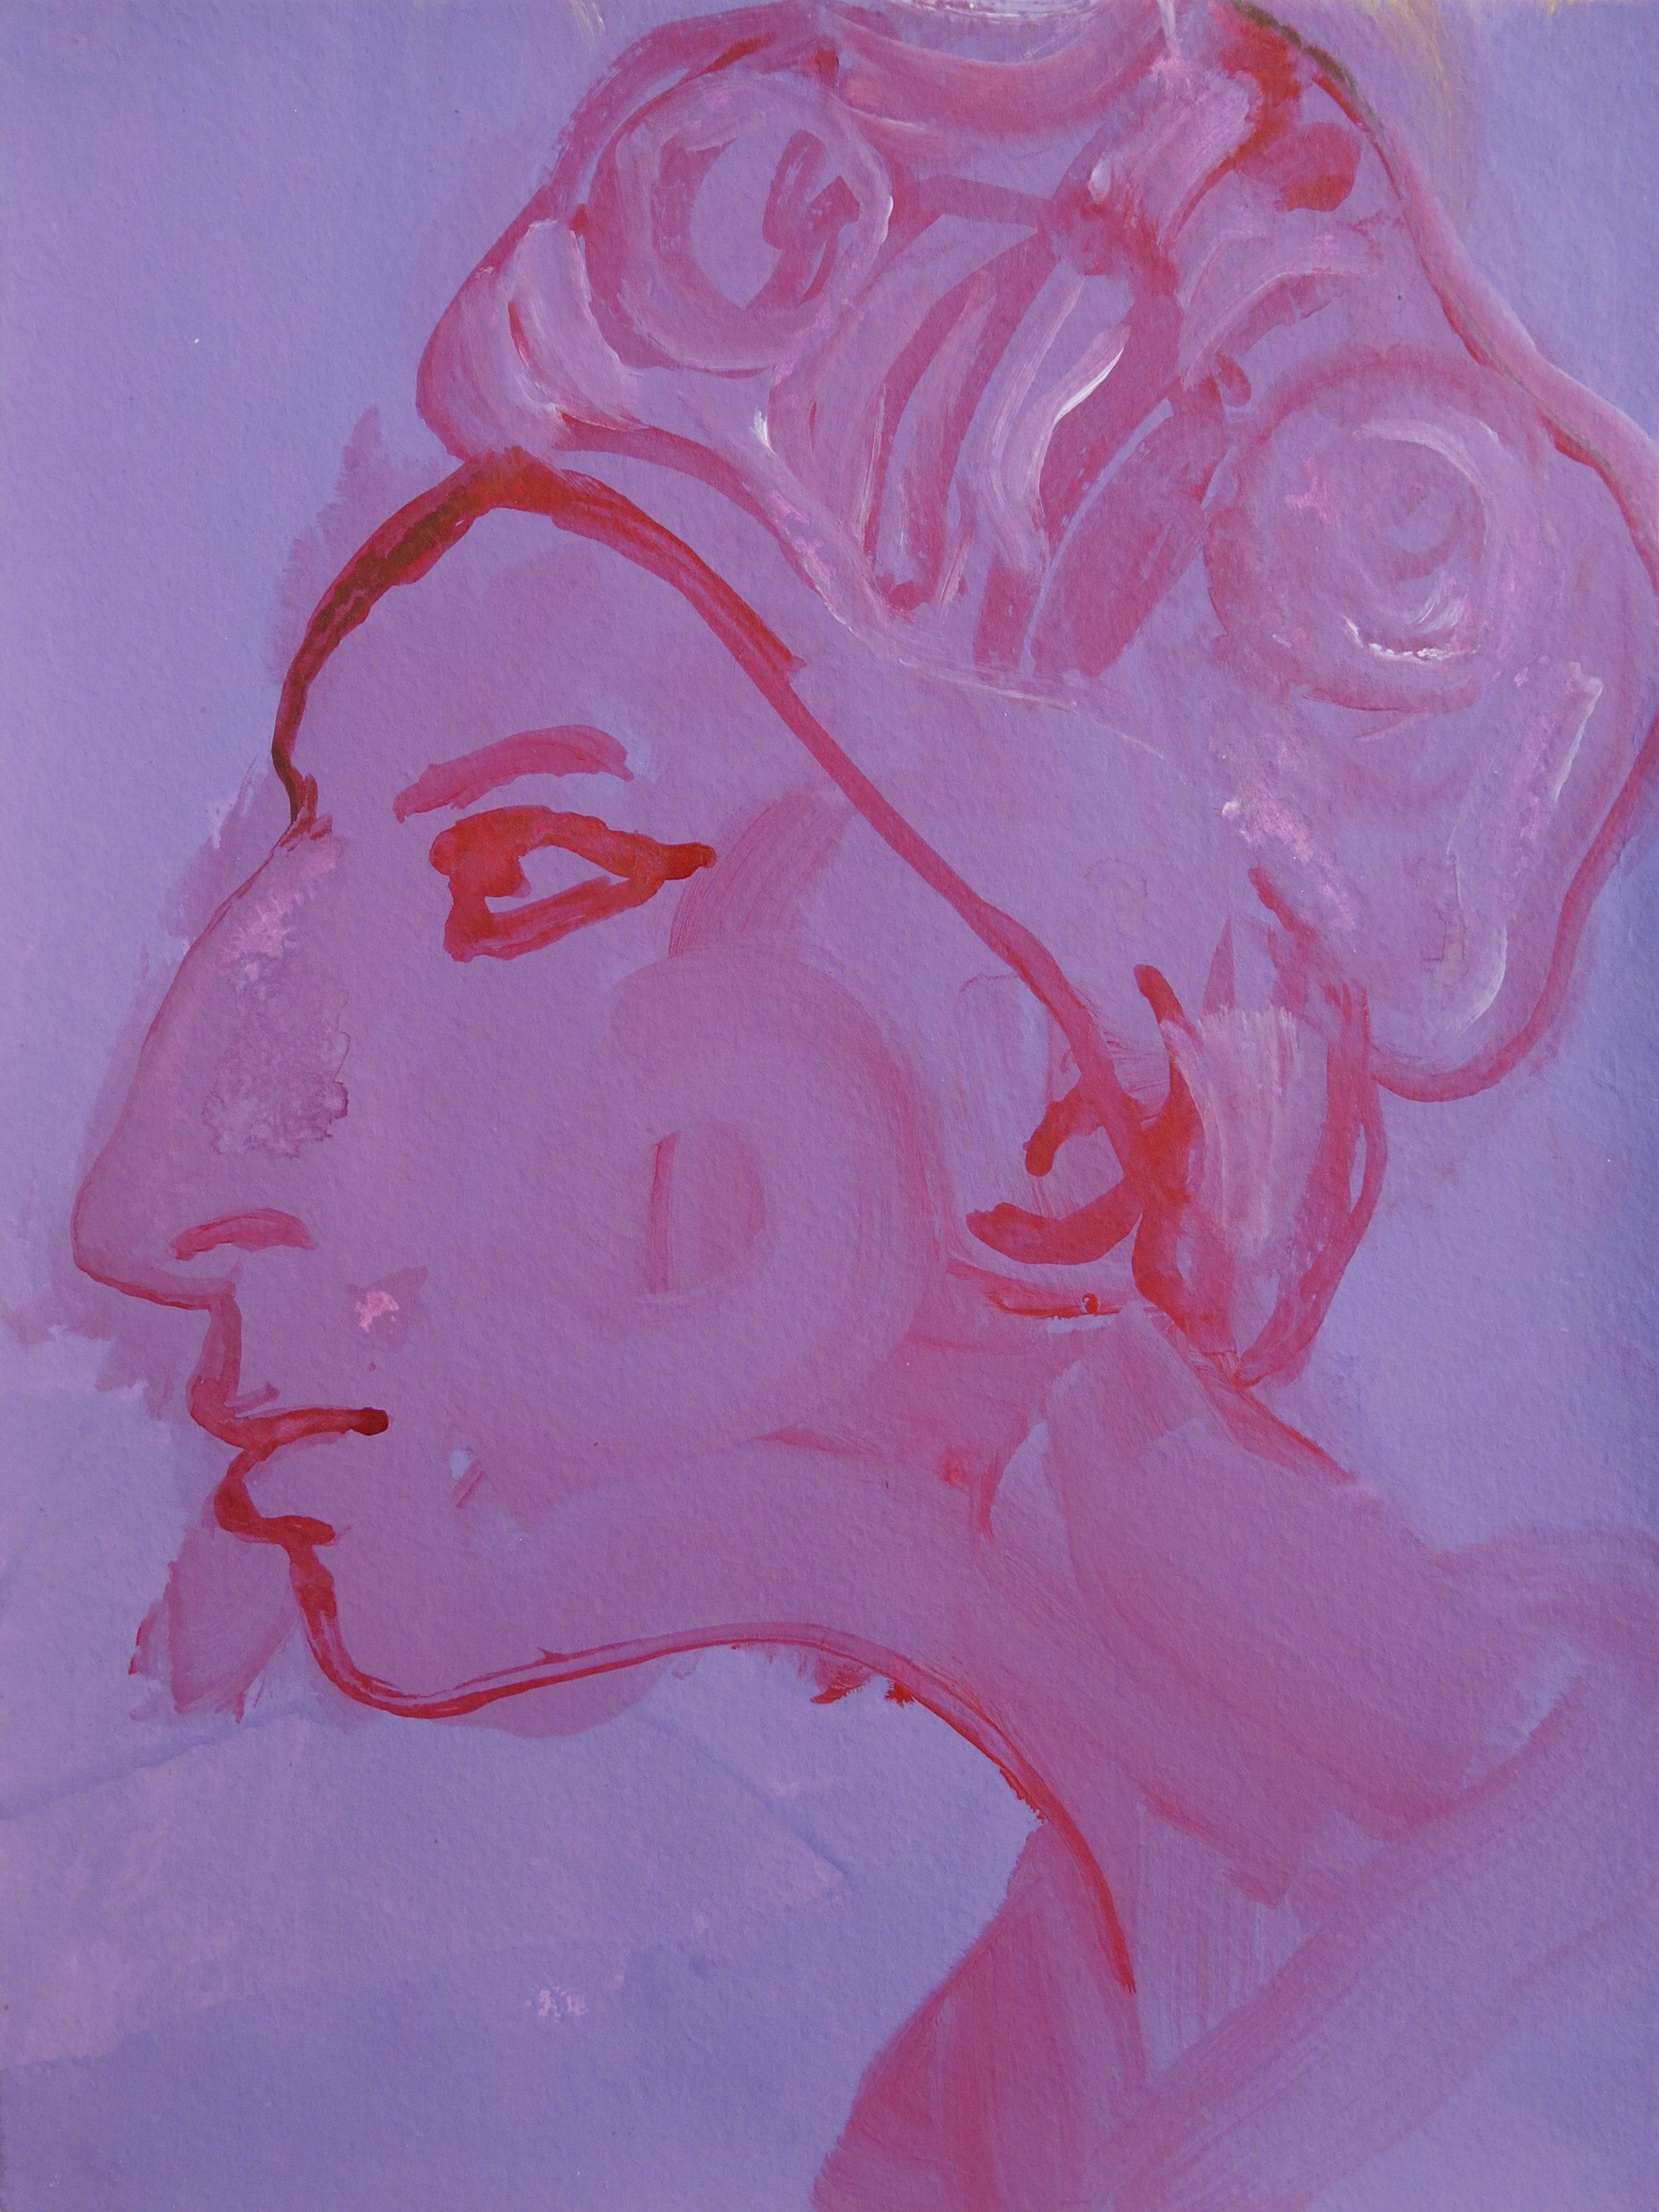 Barbra Streisand Portrait #25